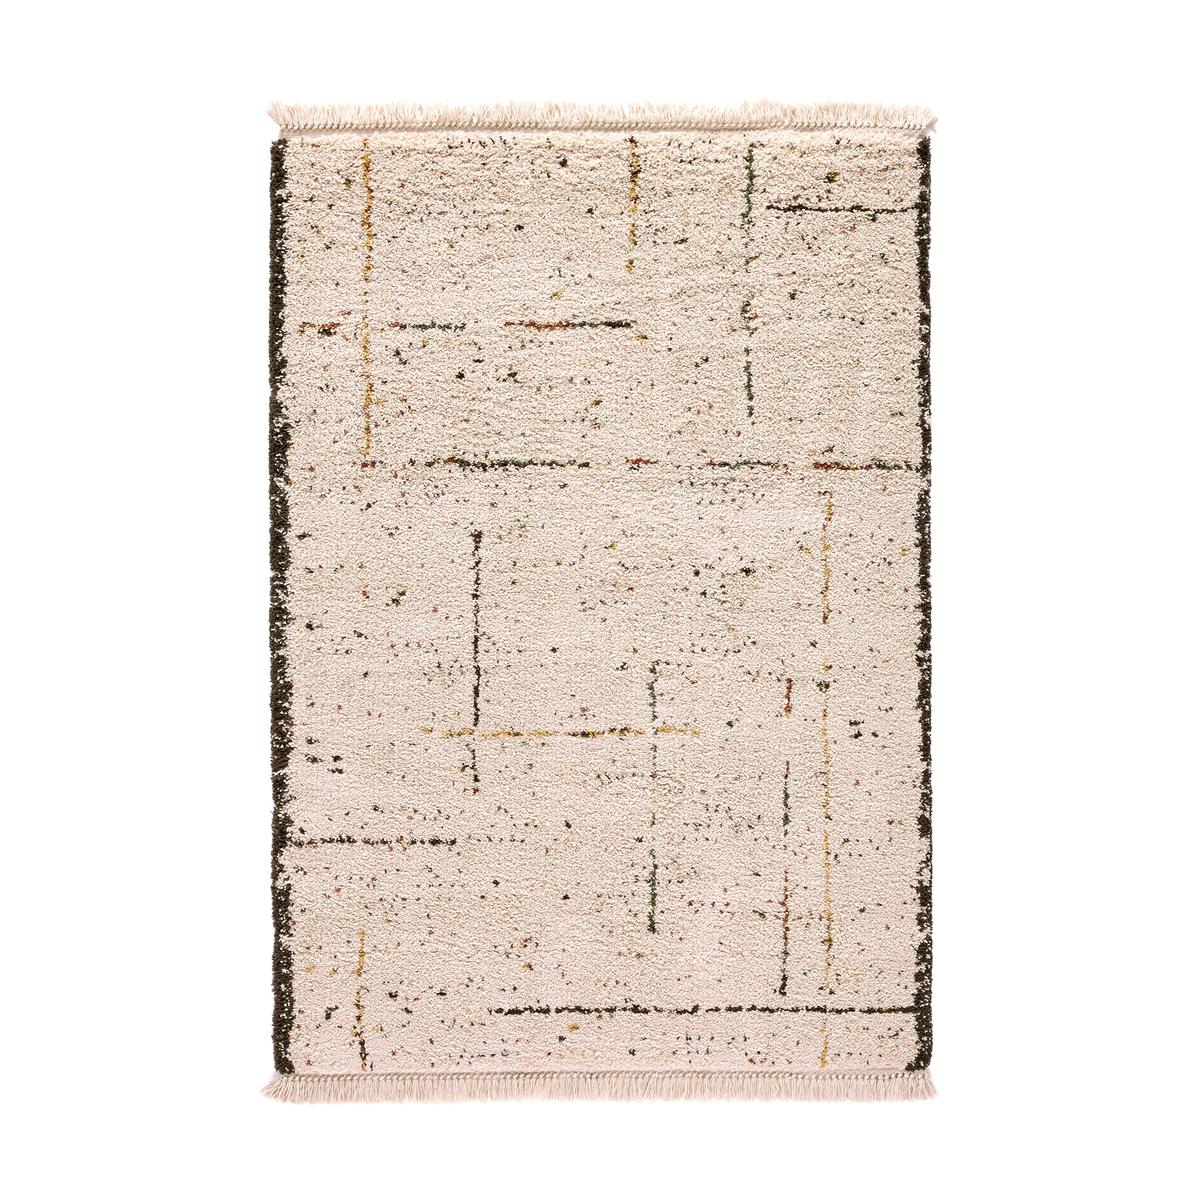 Ковер La Redoute Matelin в арабском стиле 120 x 170 см бежевый ковер la redoute шерсть в берберском стиле anton 120 x 170 см бежевый